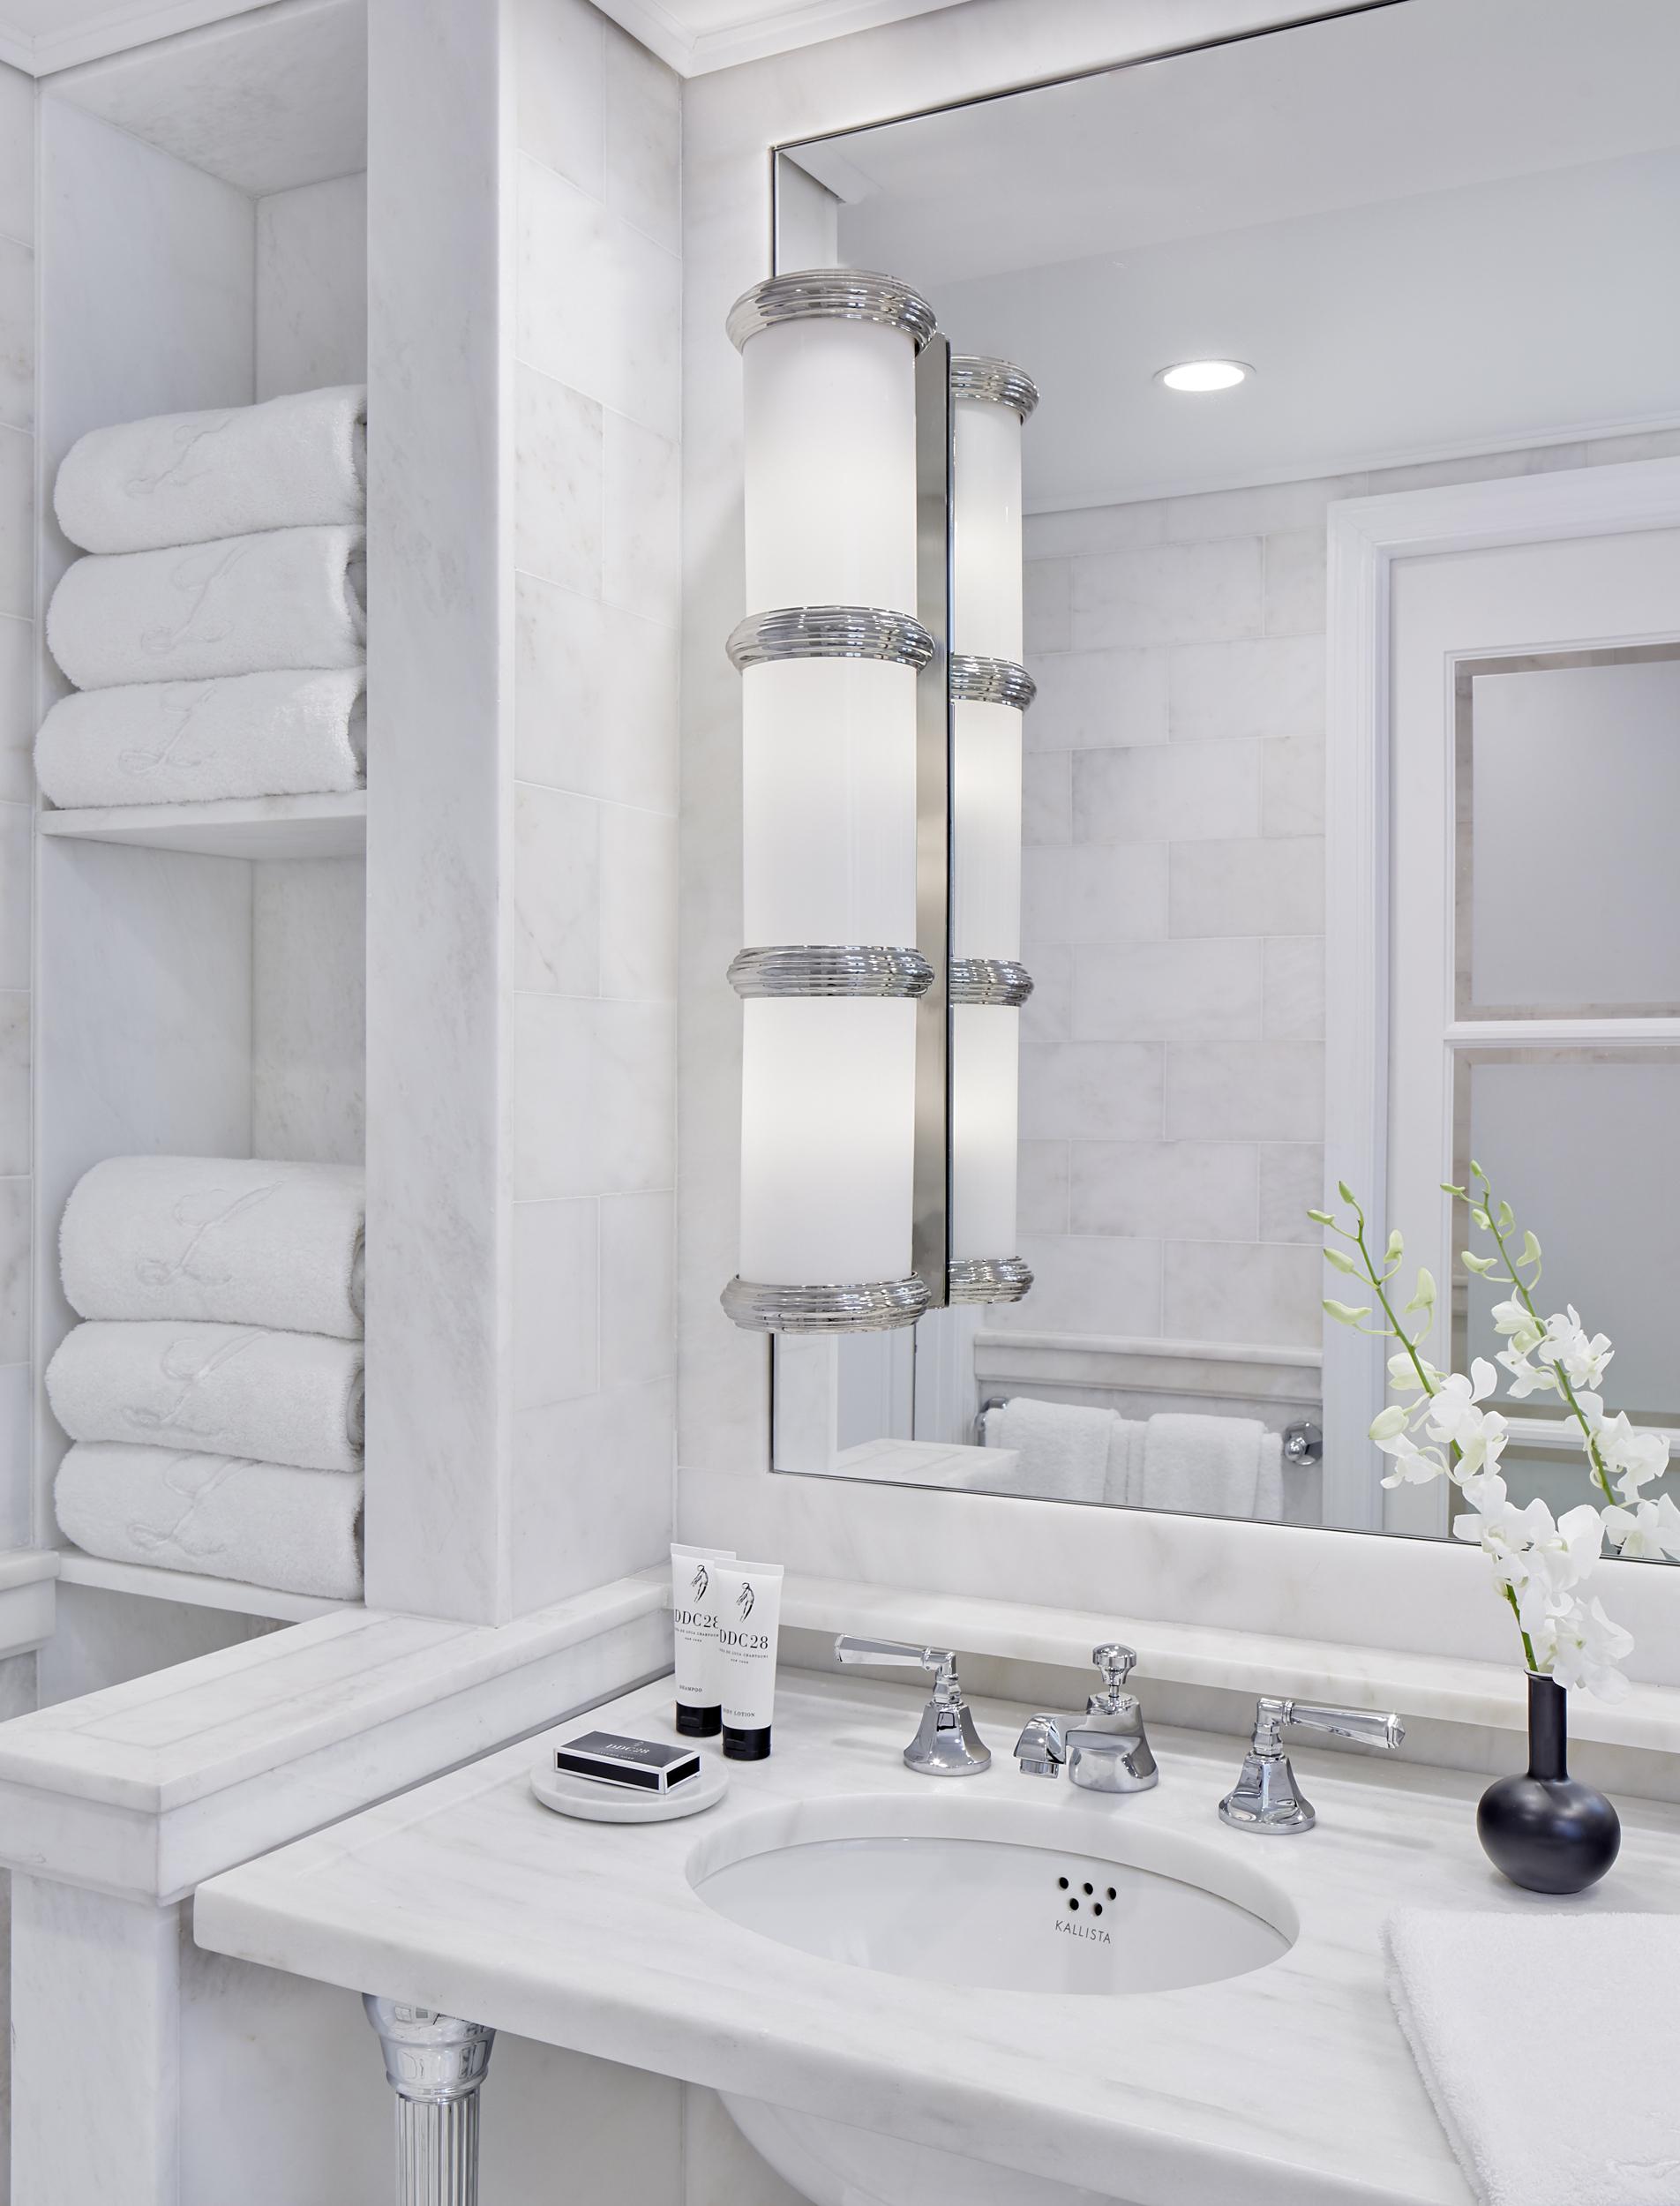 Lowell King Bathroom.jpg